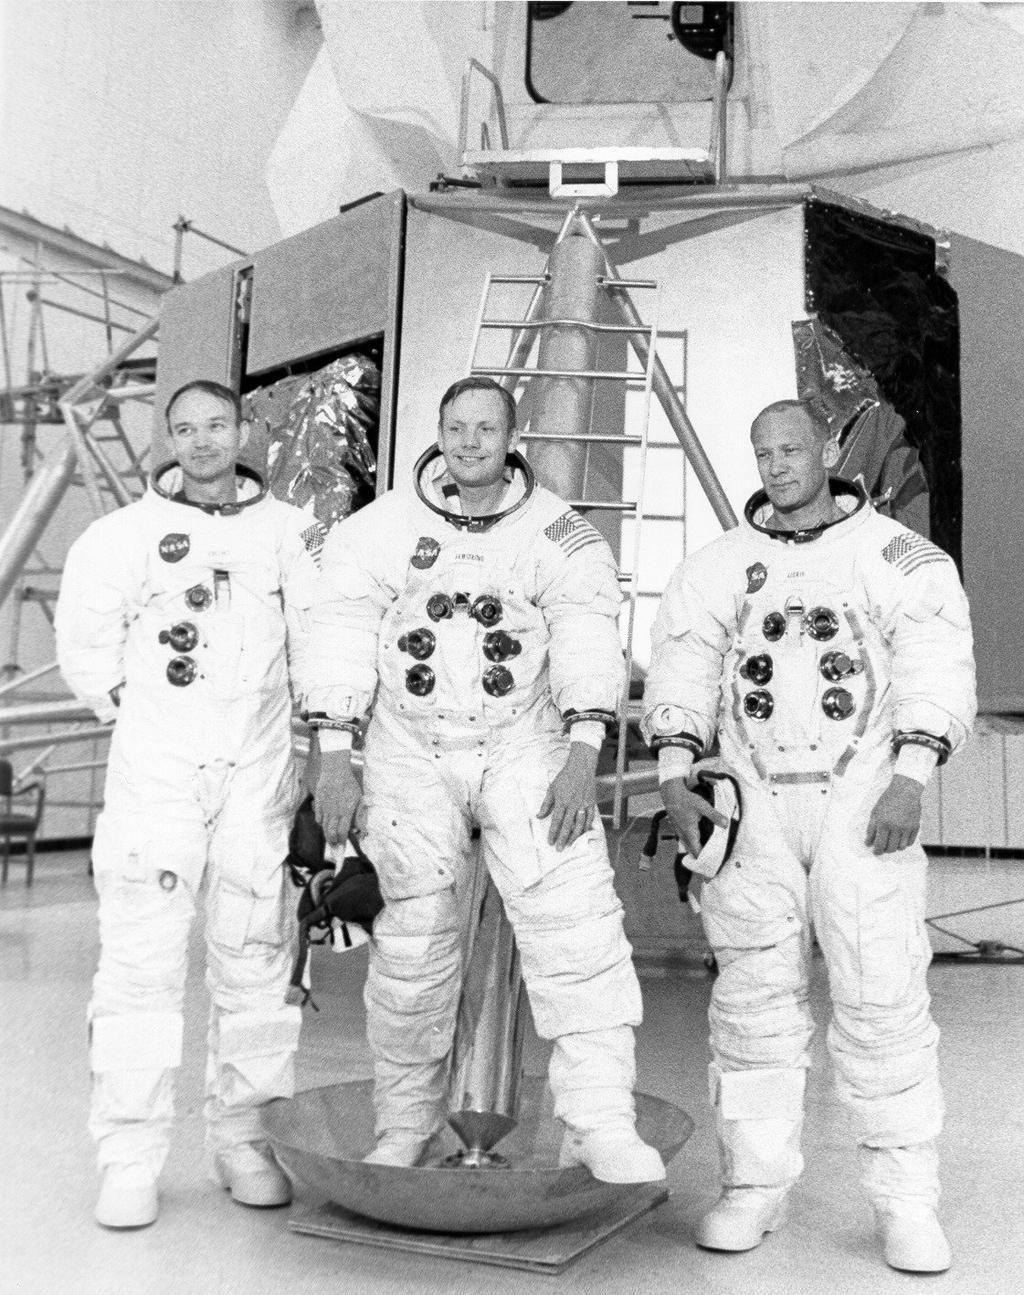 apollo 11 mission space race - photo #42